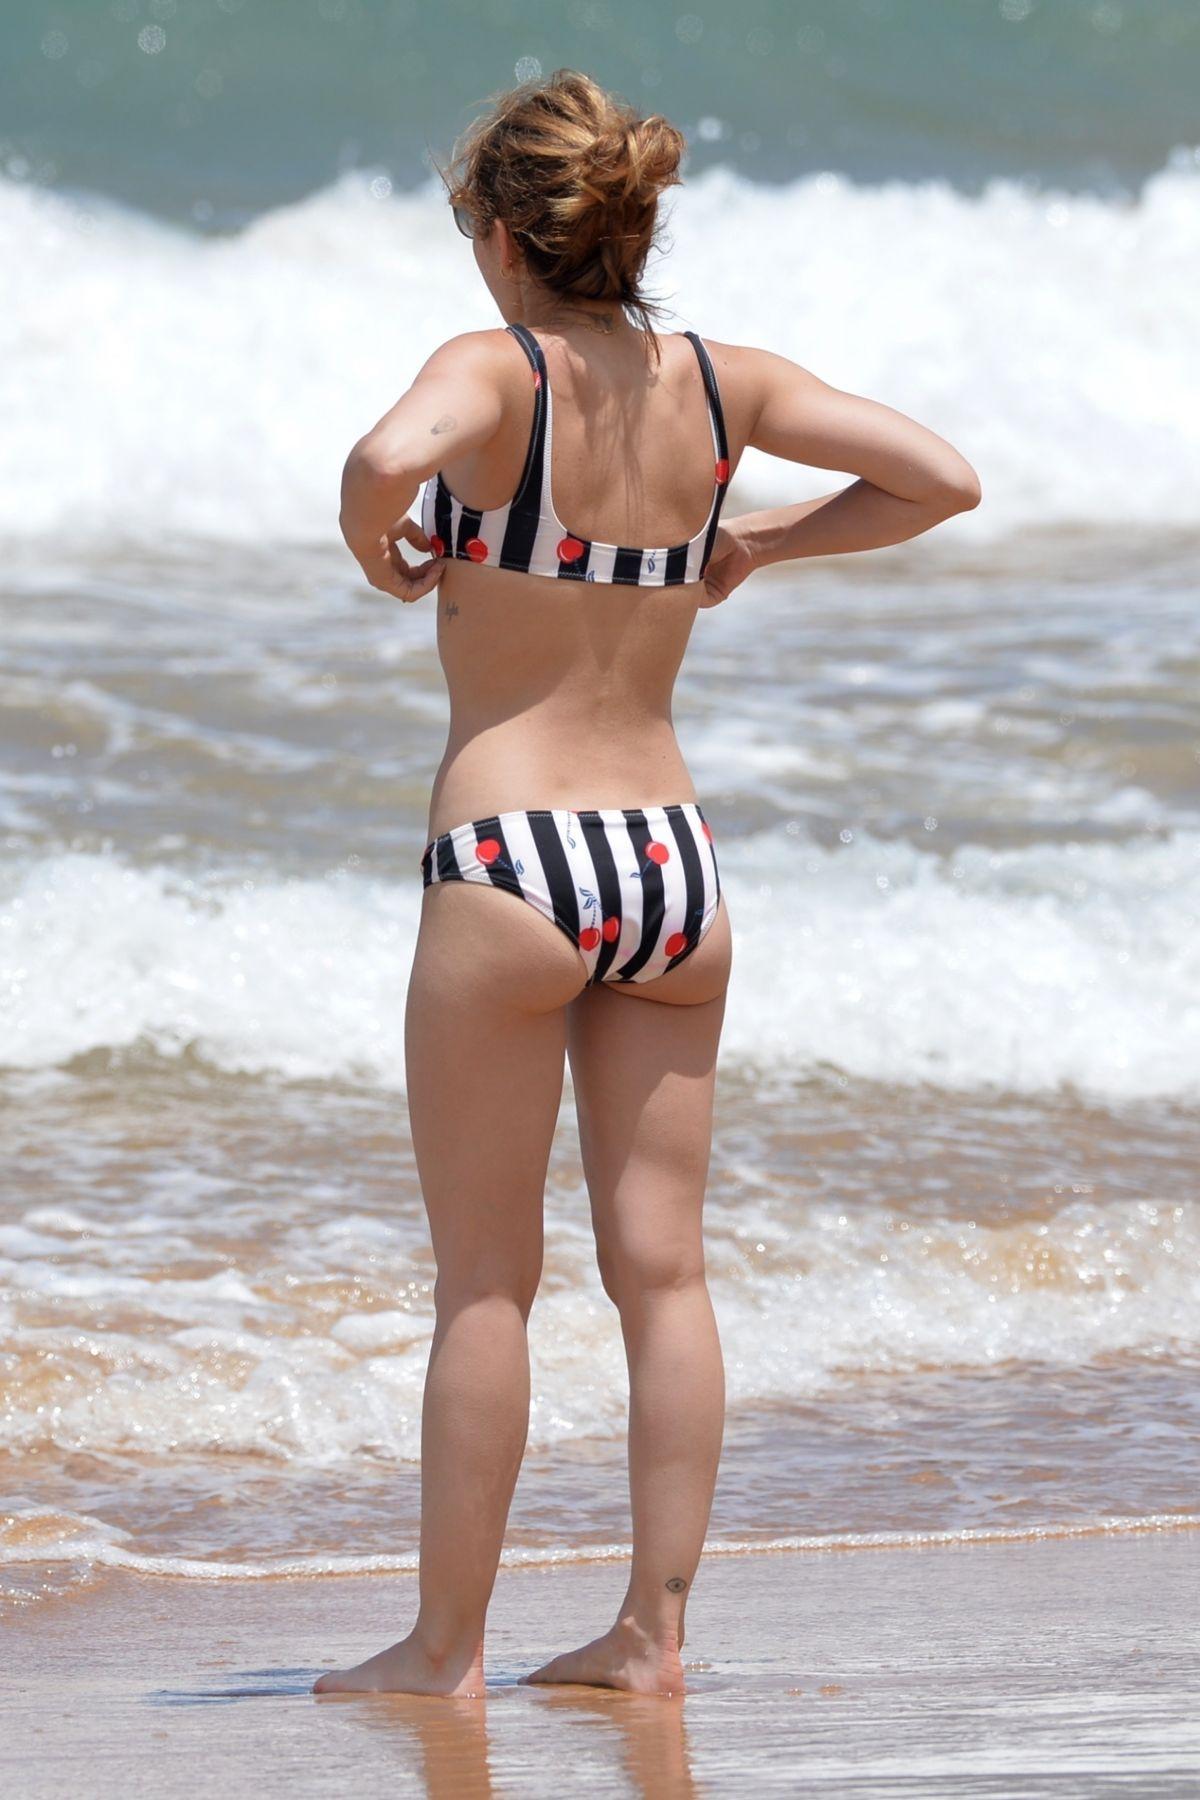 Bikini Lucy Hale nude photos 2019